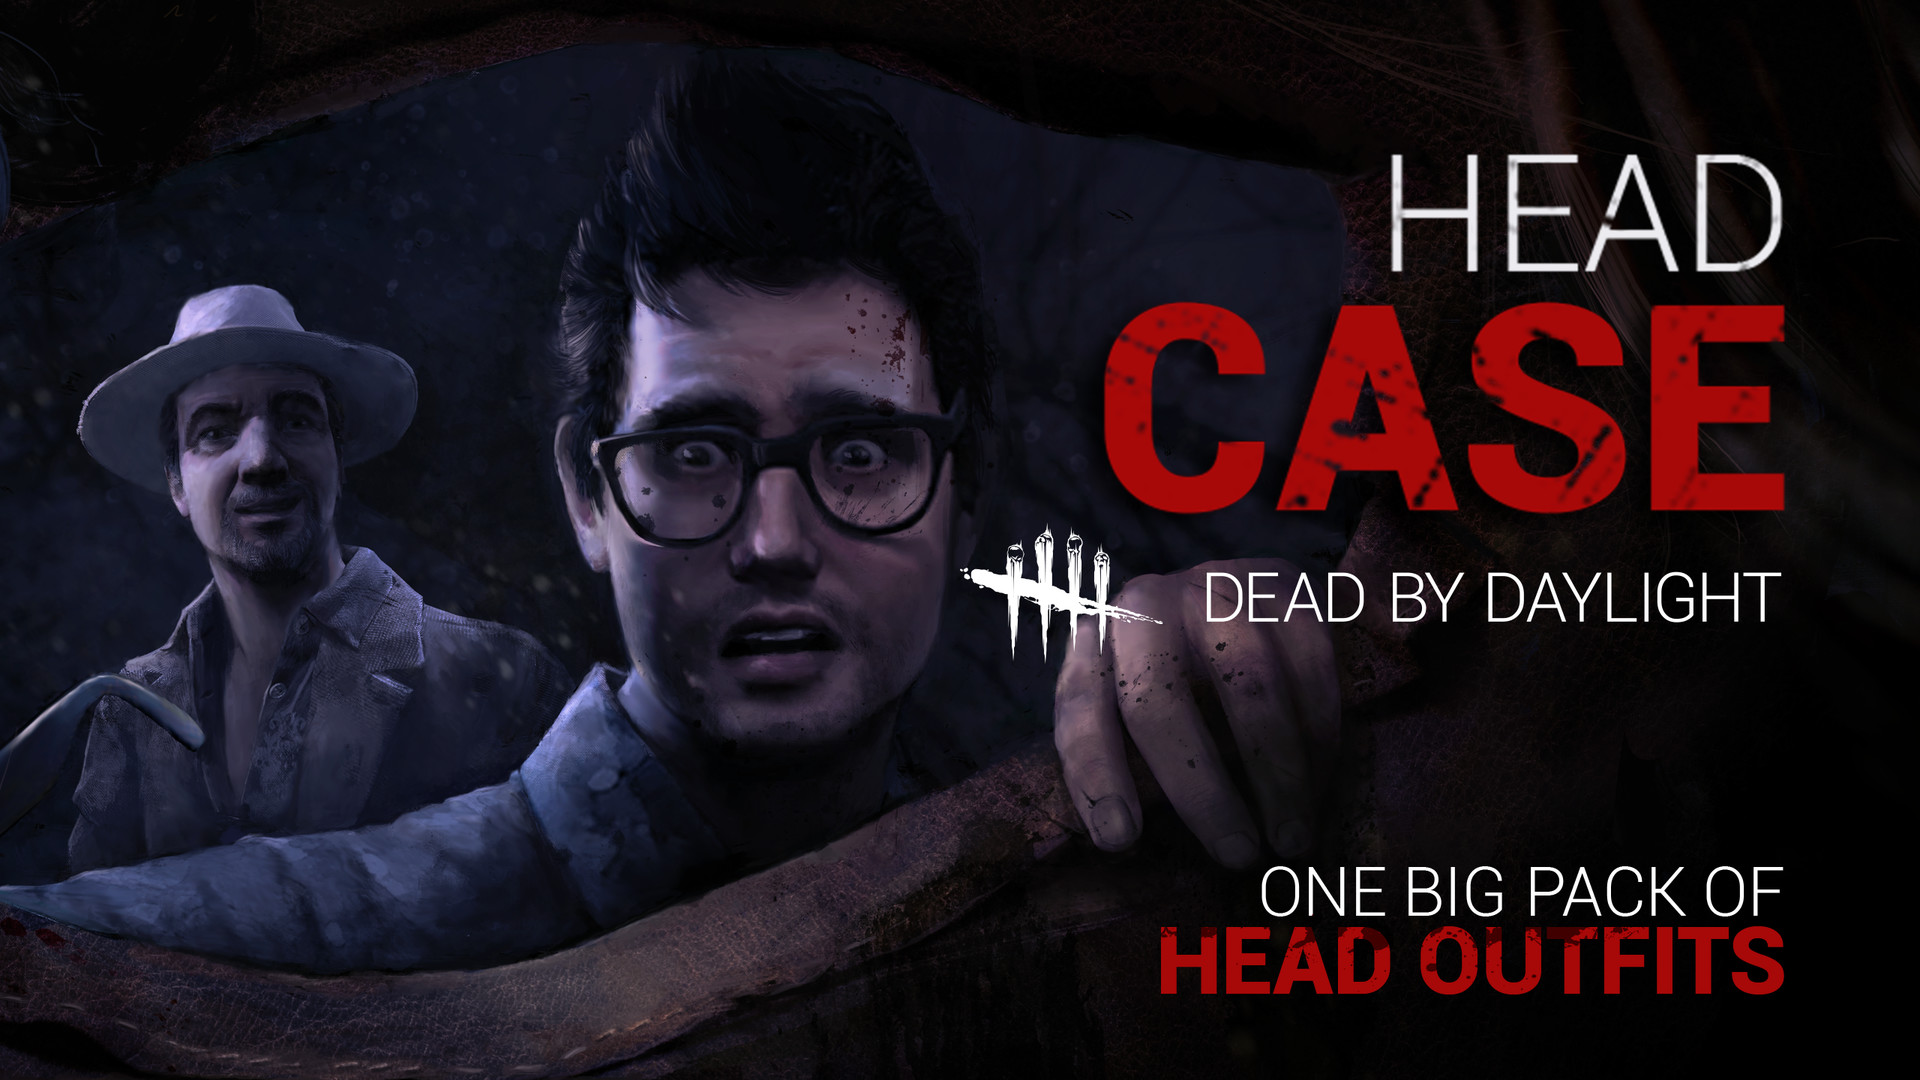 KHAiHOM.com - Dead by Daylight - Headcase